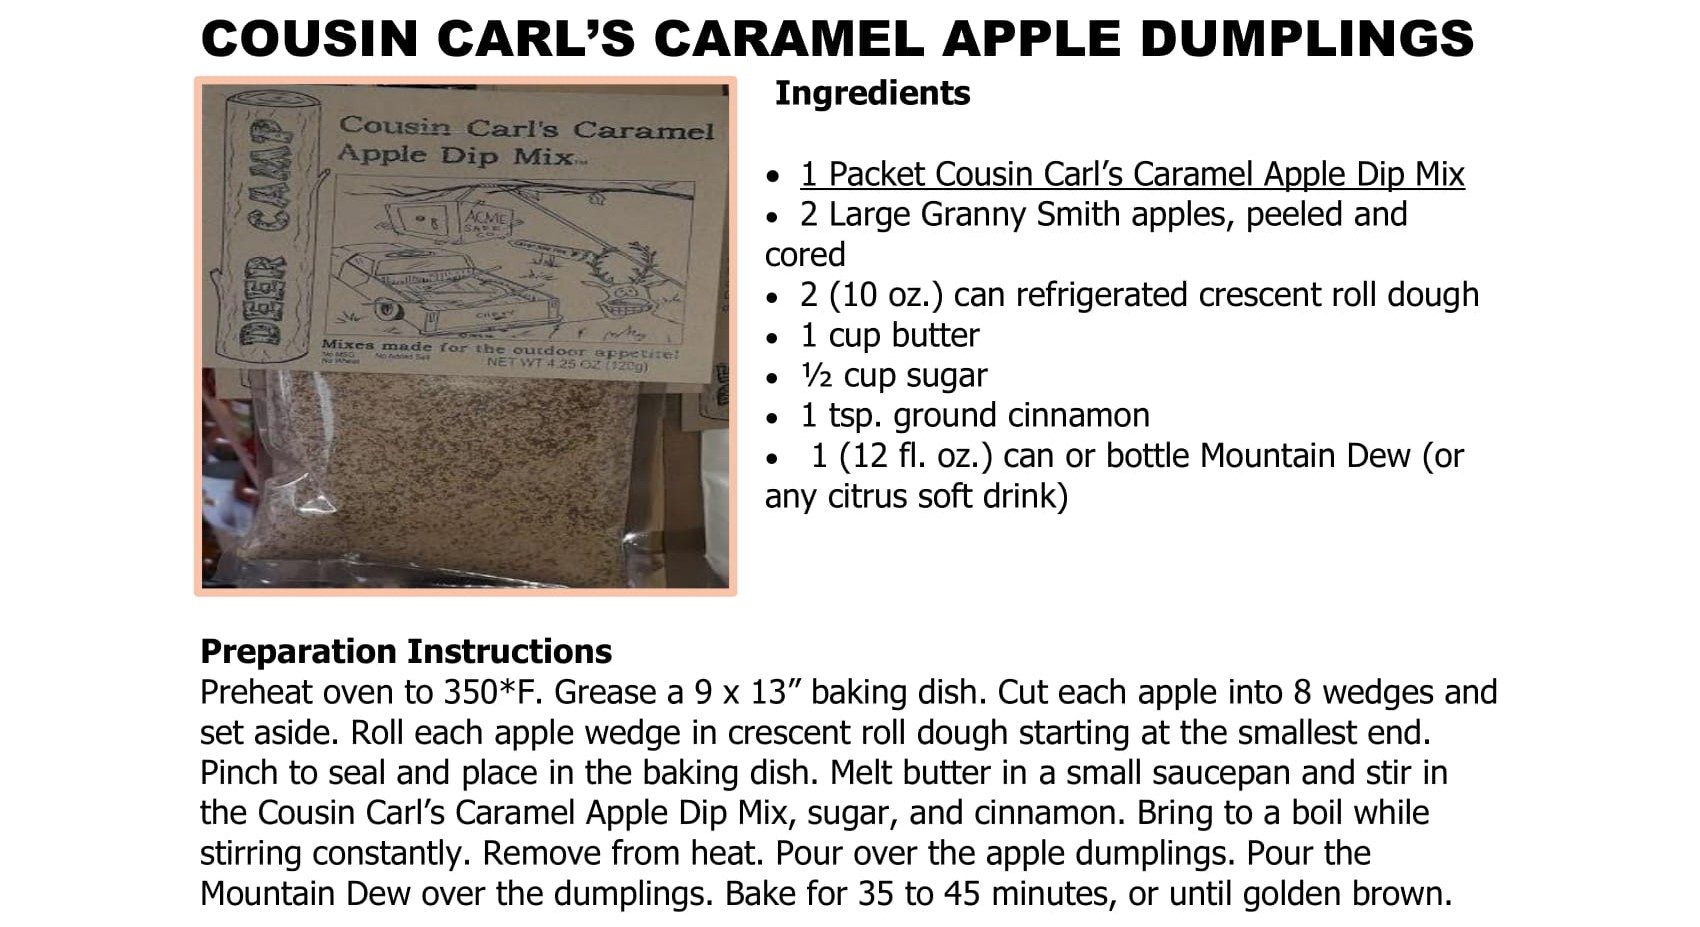 dc-caramel-apple-dumplings.jpg